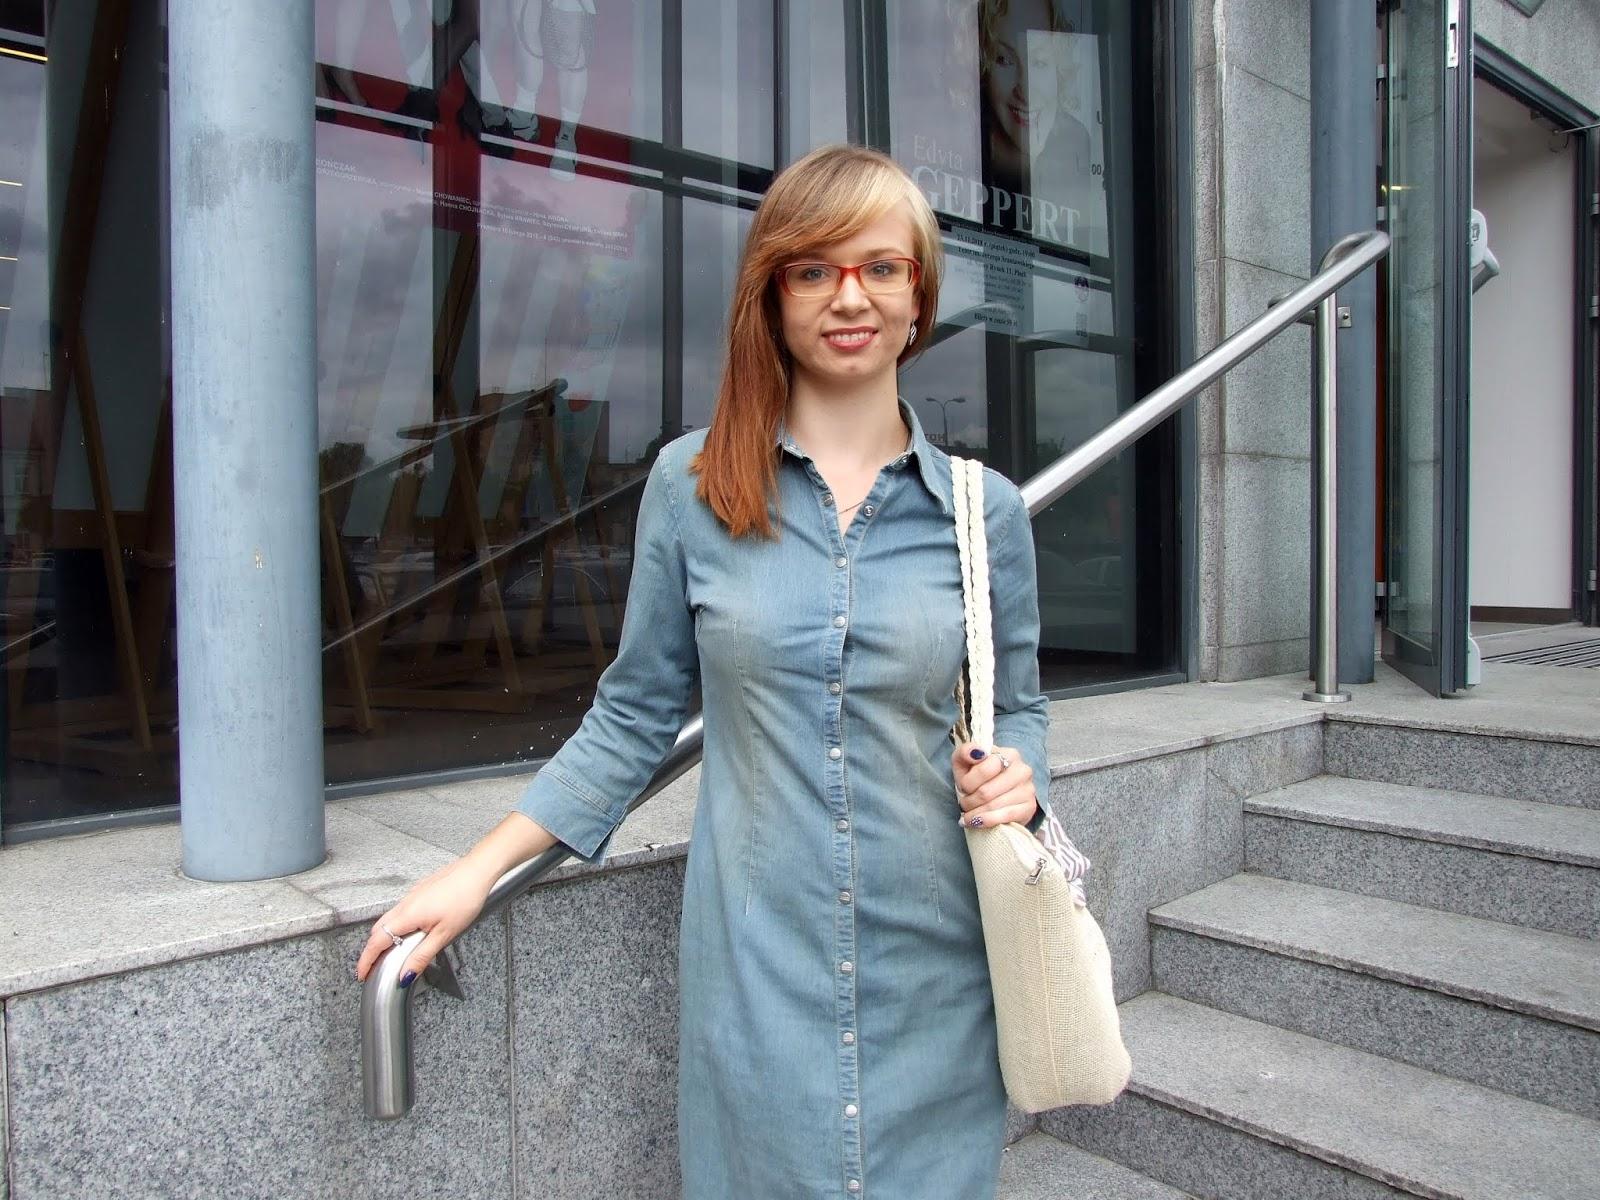 Dżinsowa sukienka z koturnami